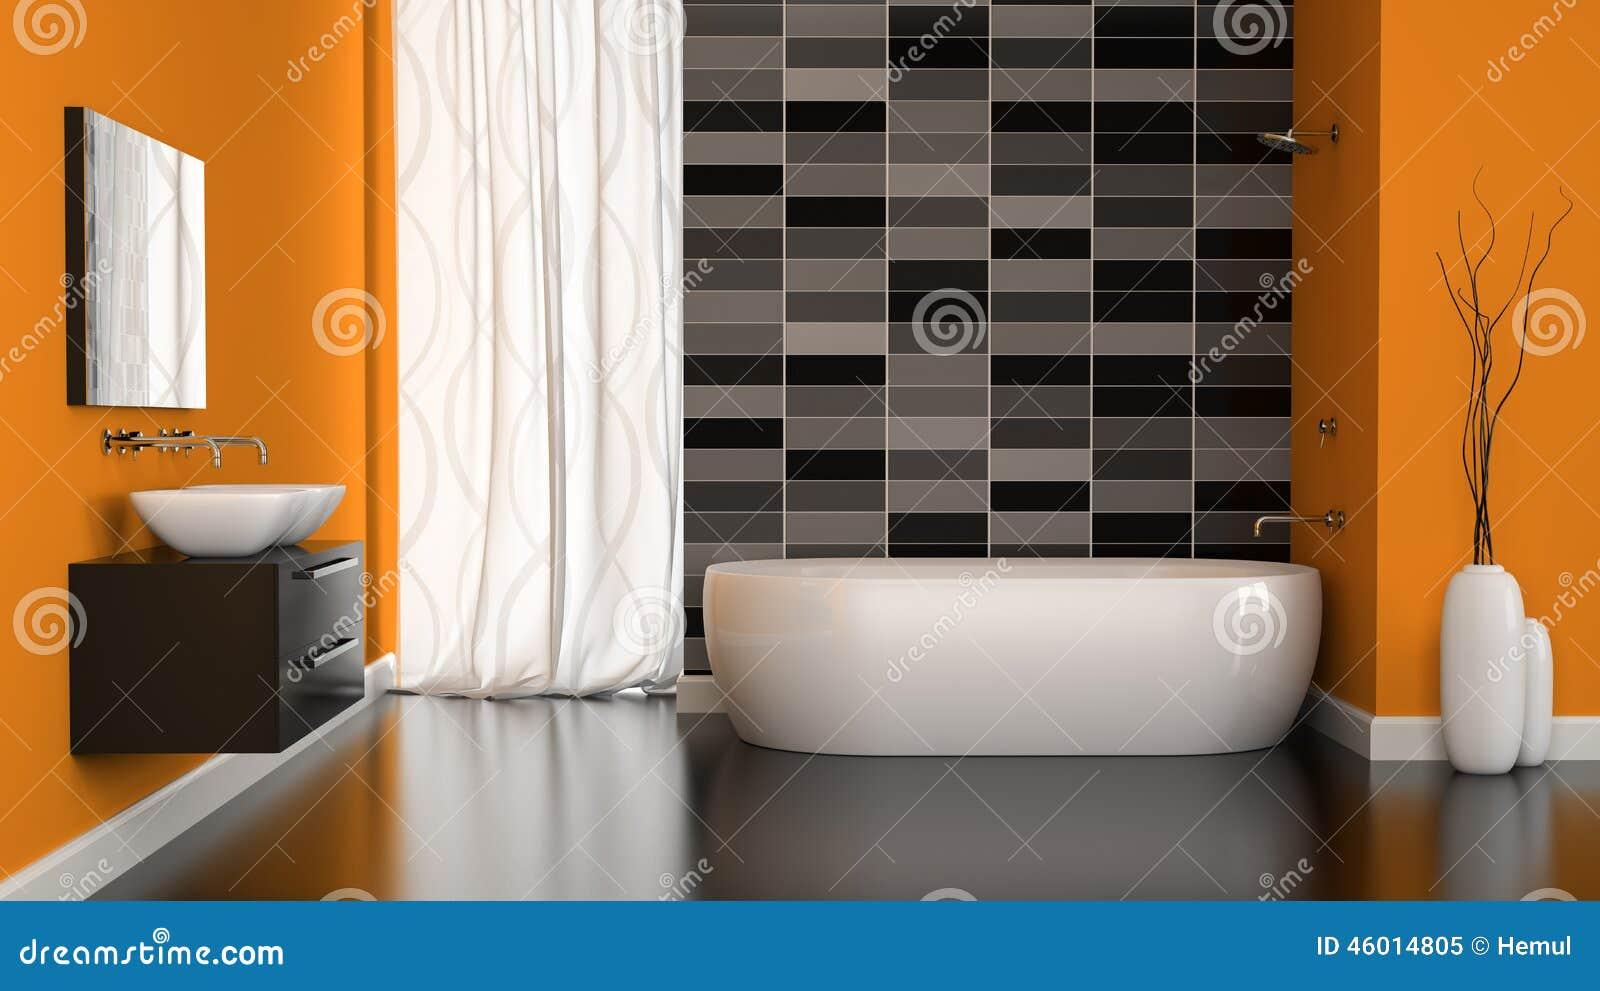 Bagno arancione awesome bagno arancione with bagno arancione